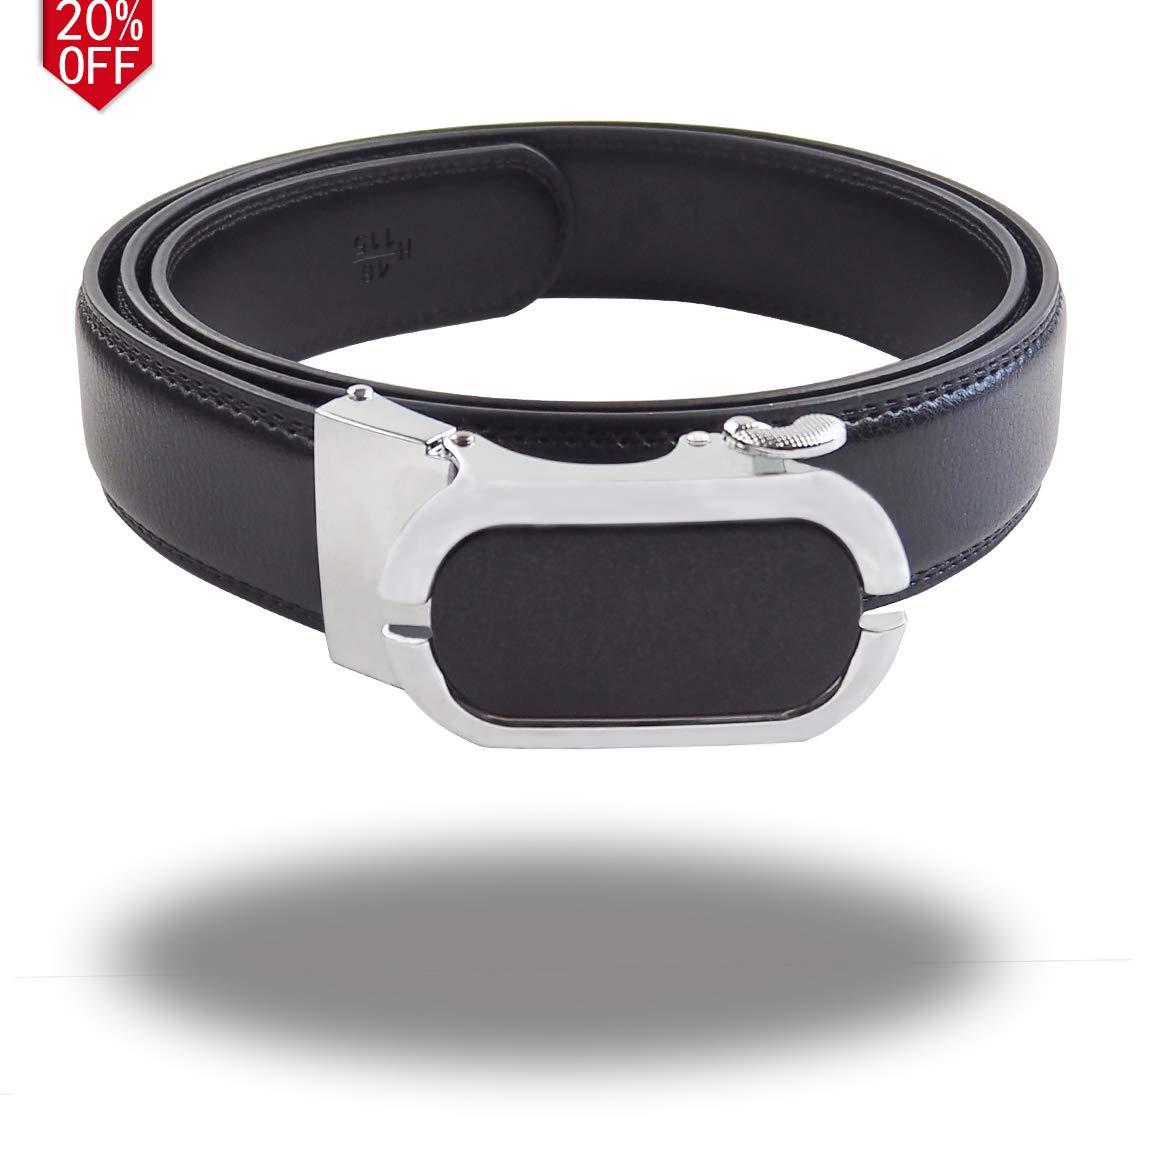 KEYNAT Men's Dress Classic Ratchet Leather Belt-Adjustable Buckle - Nickel free (01Black)